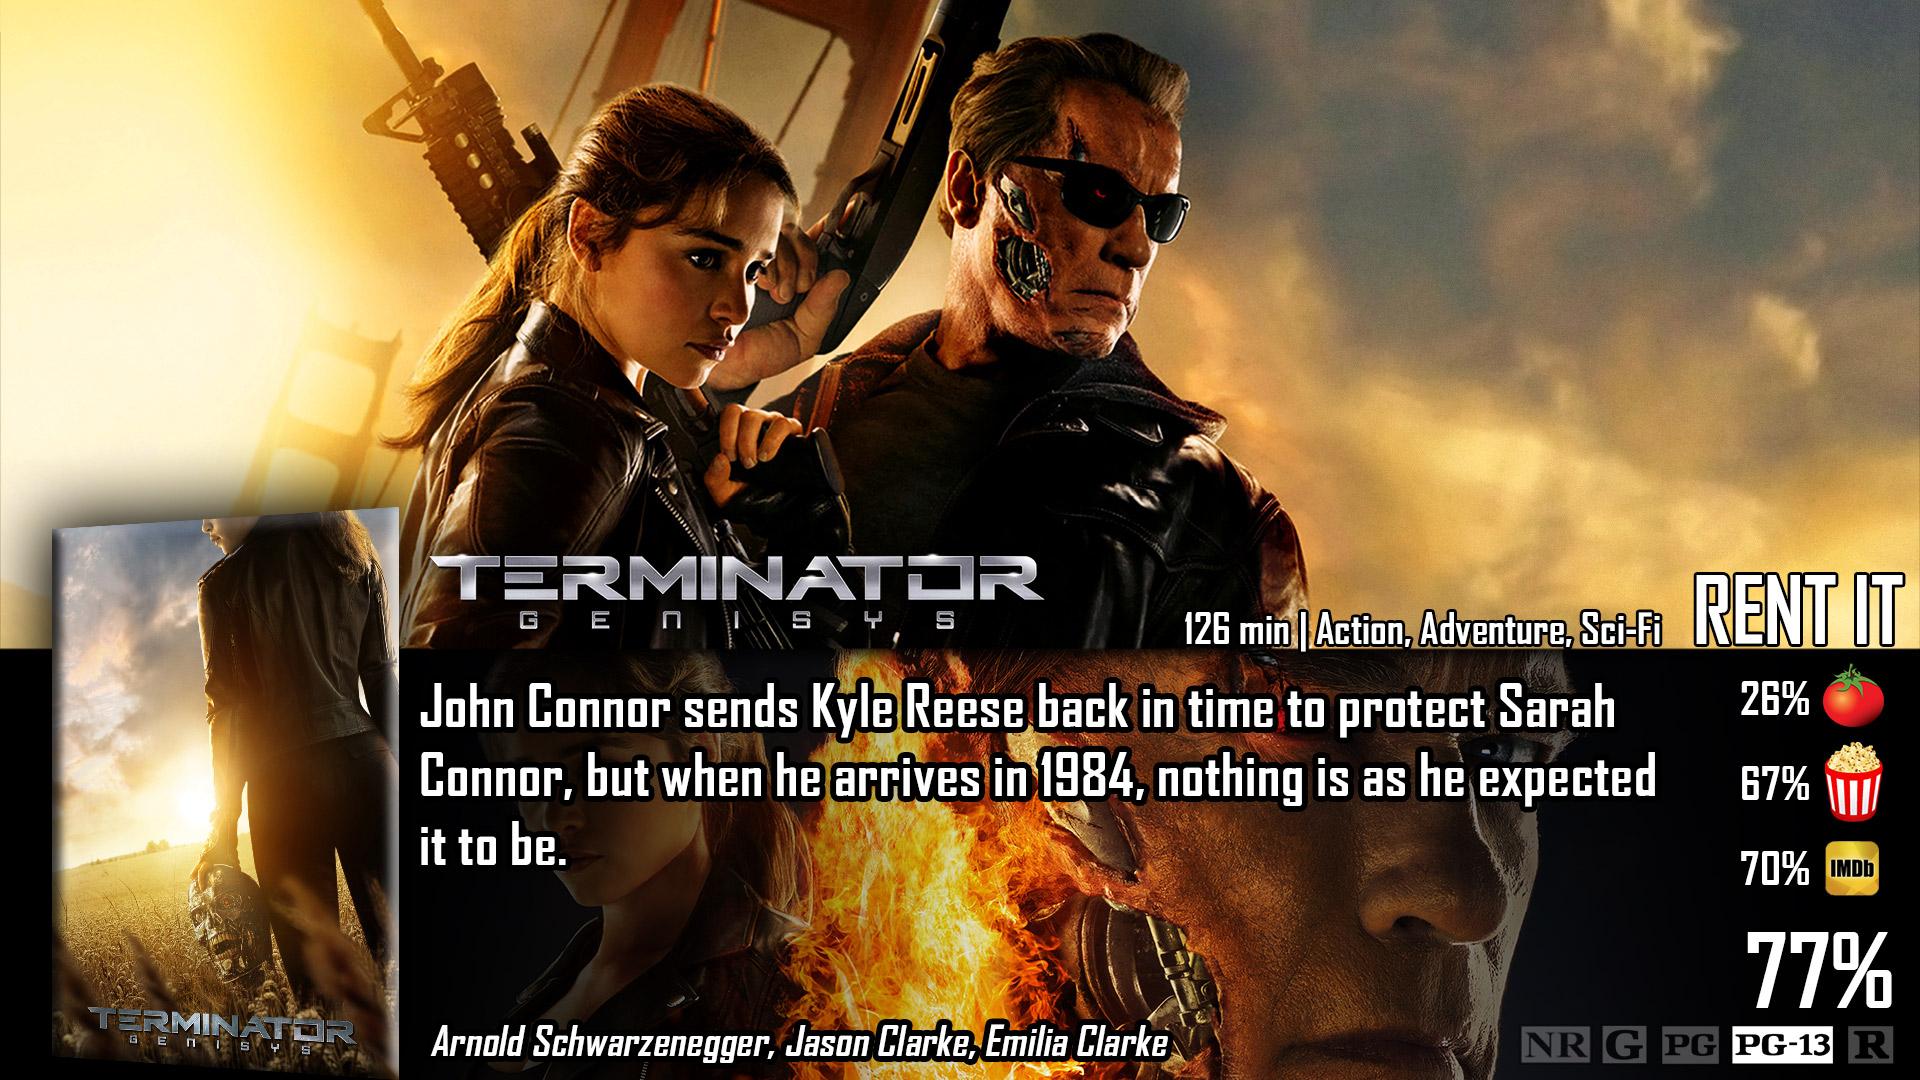 terminator genisys full movie hd in hindi